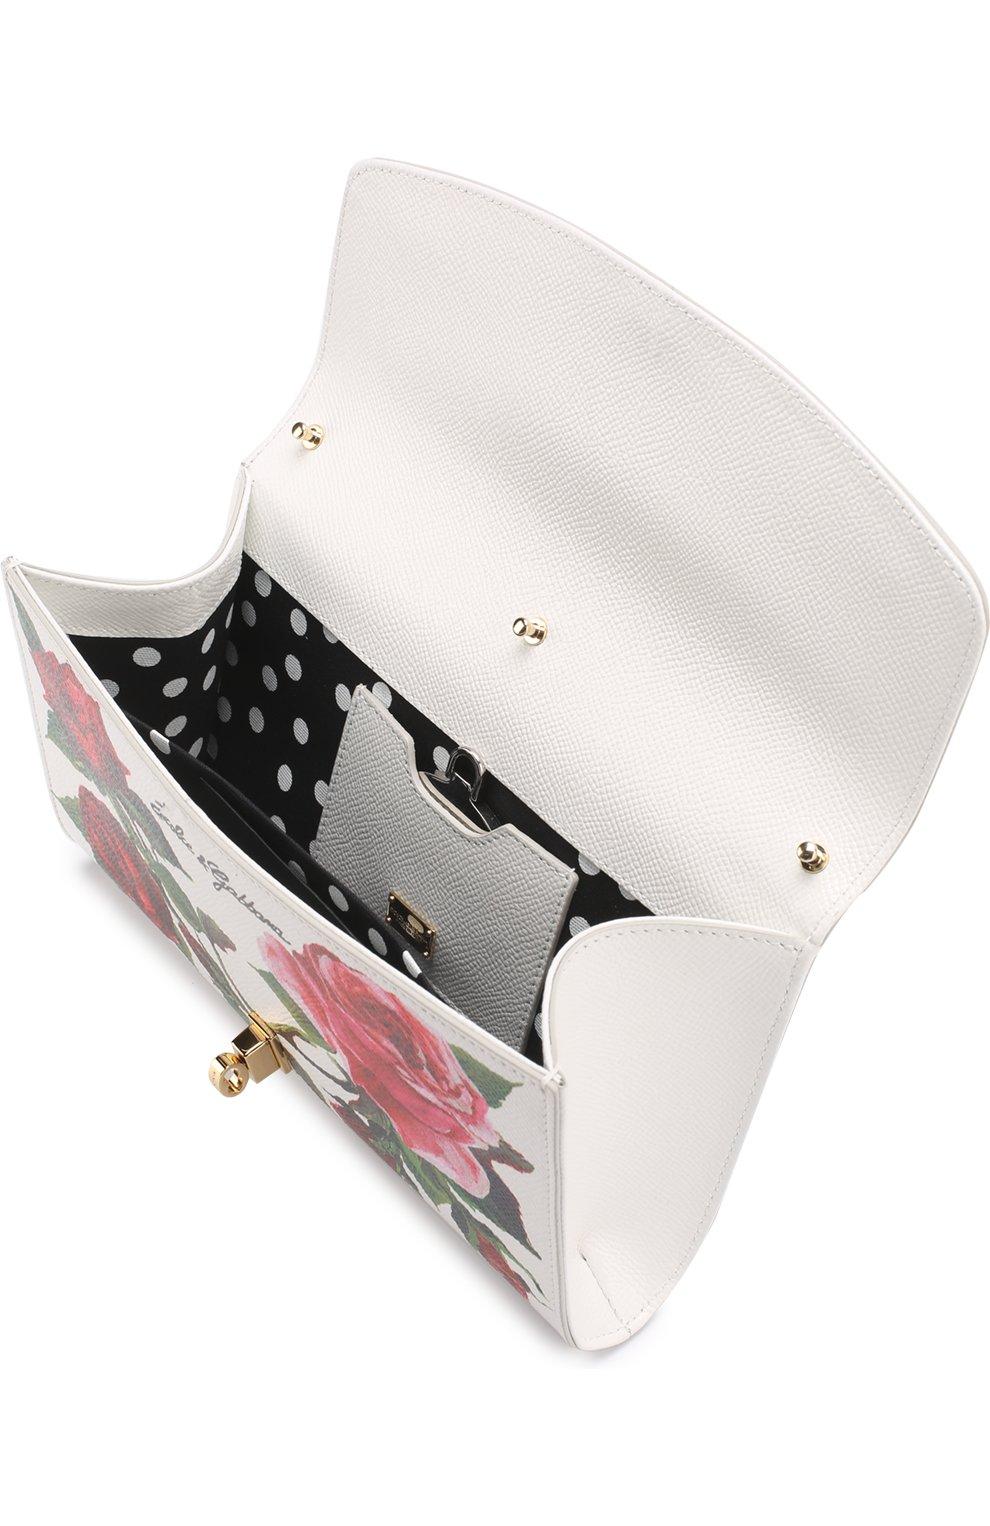 Сумка Dolce Pochette с принтом Dolce & Gabbana разноцветного цвета   Фото №3